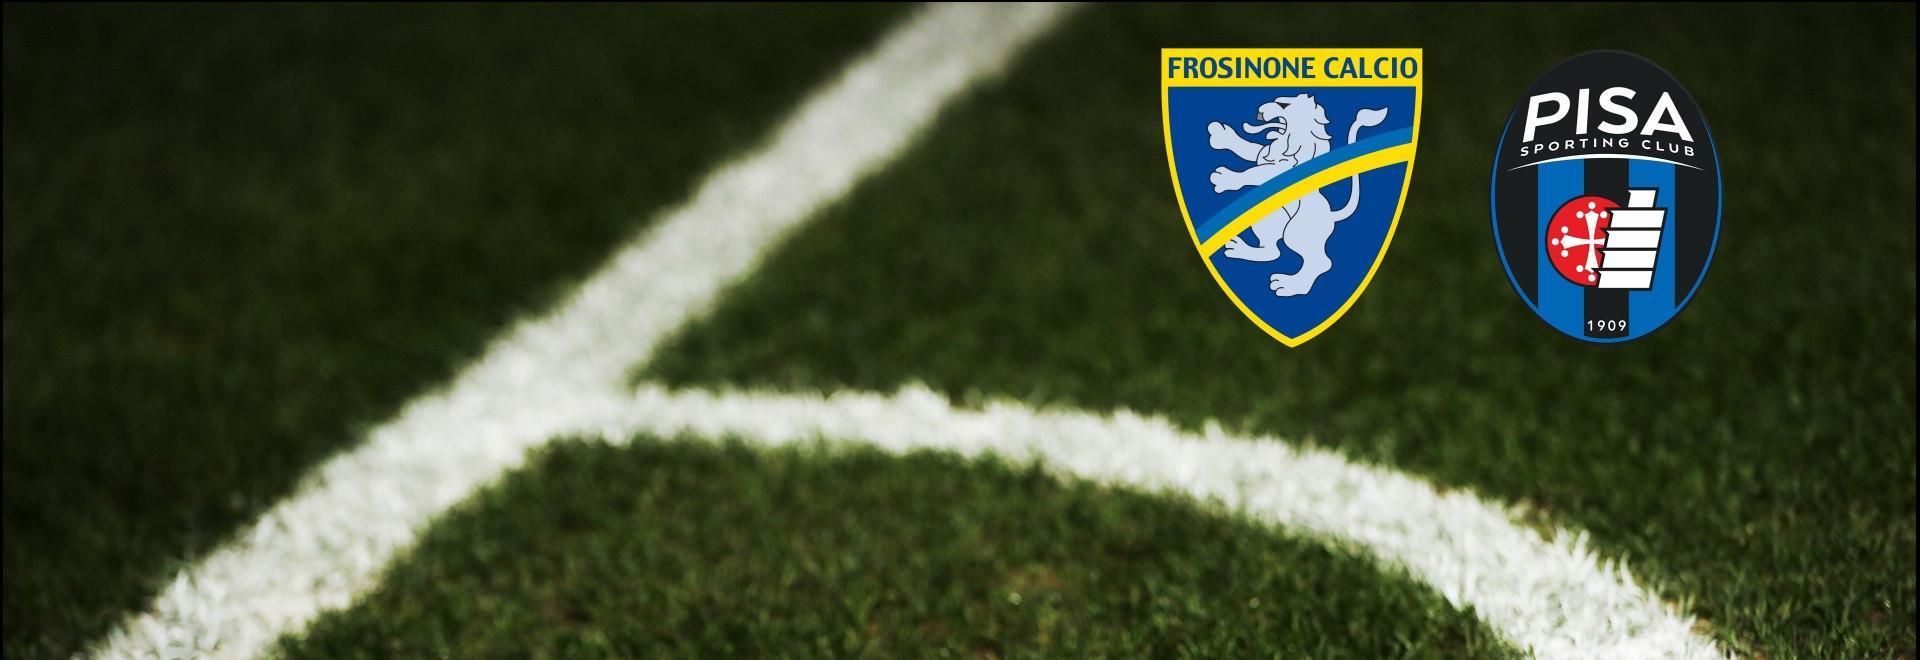 Frosinone - Pisa. 35a g.